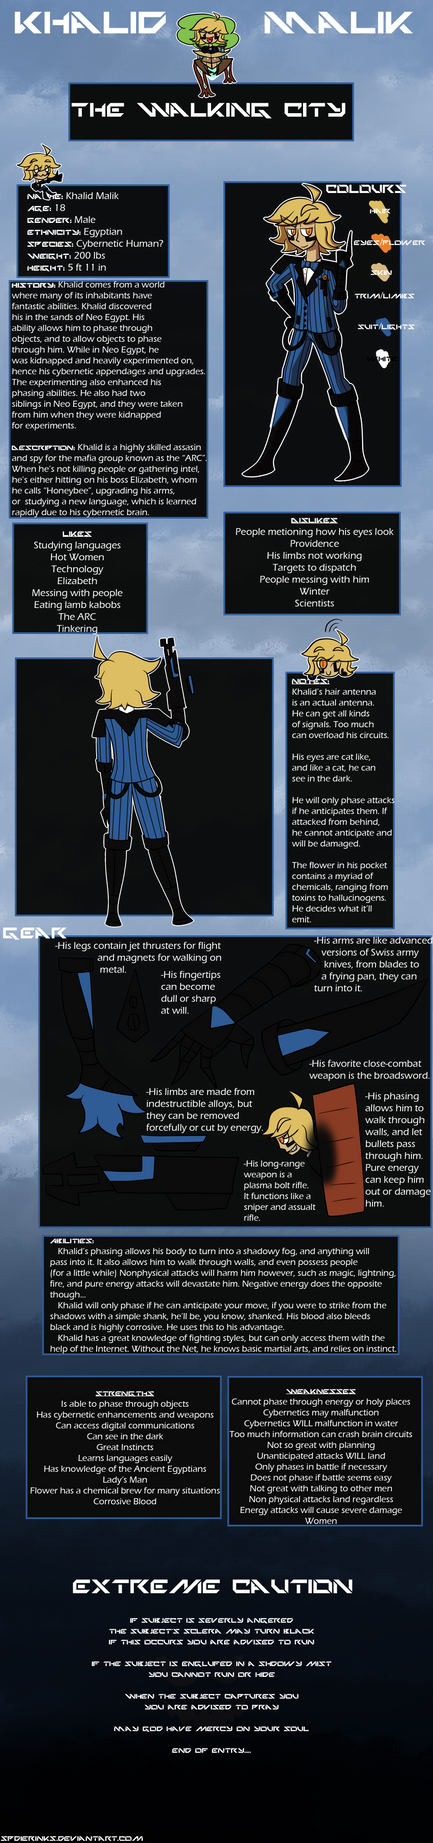 Walking City Reference: Khalid Malik by SpiderInks